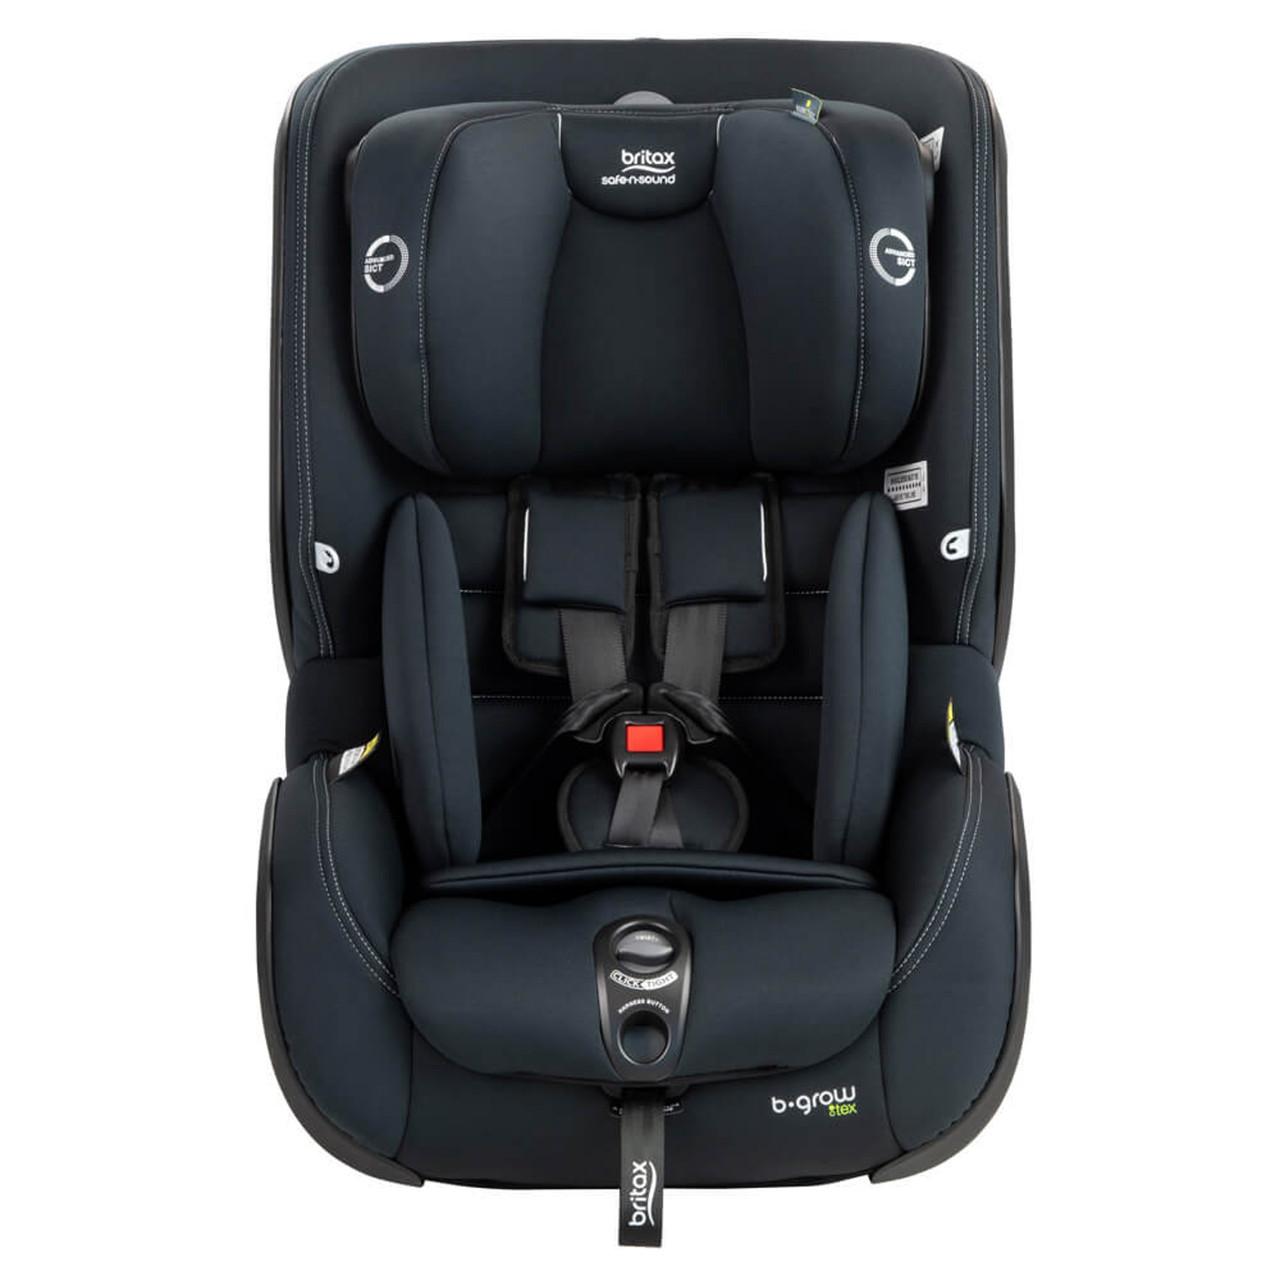 simplifies car seat installation